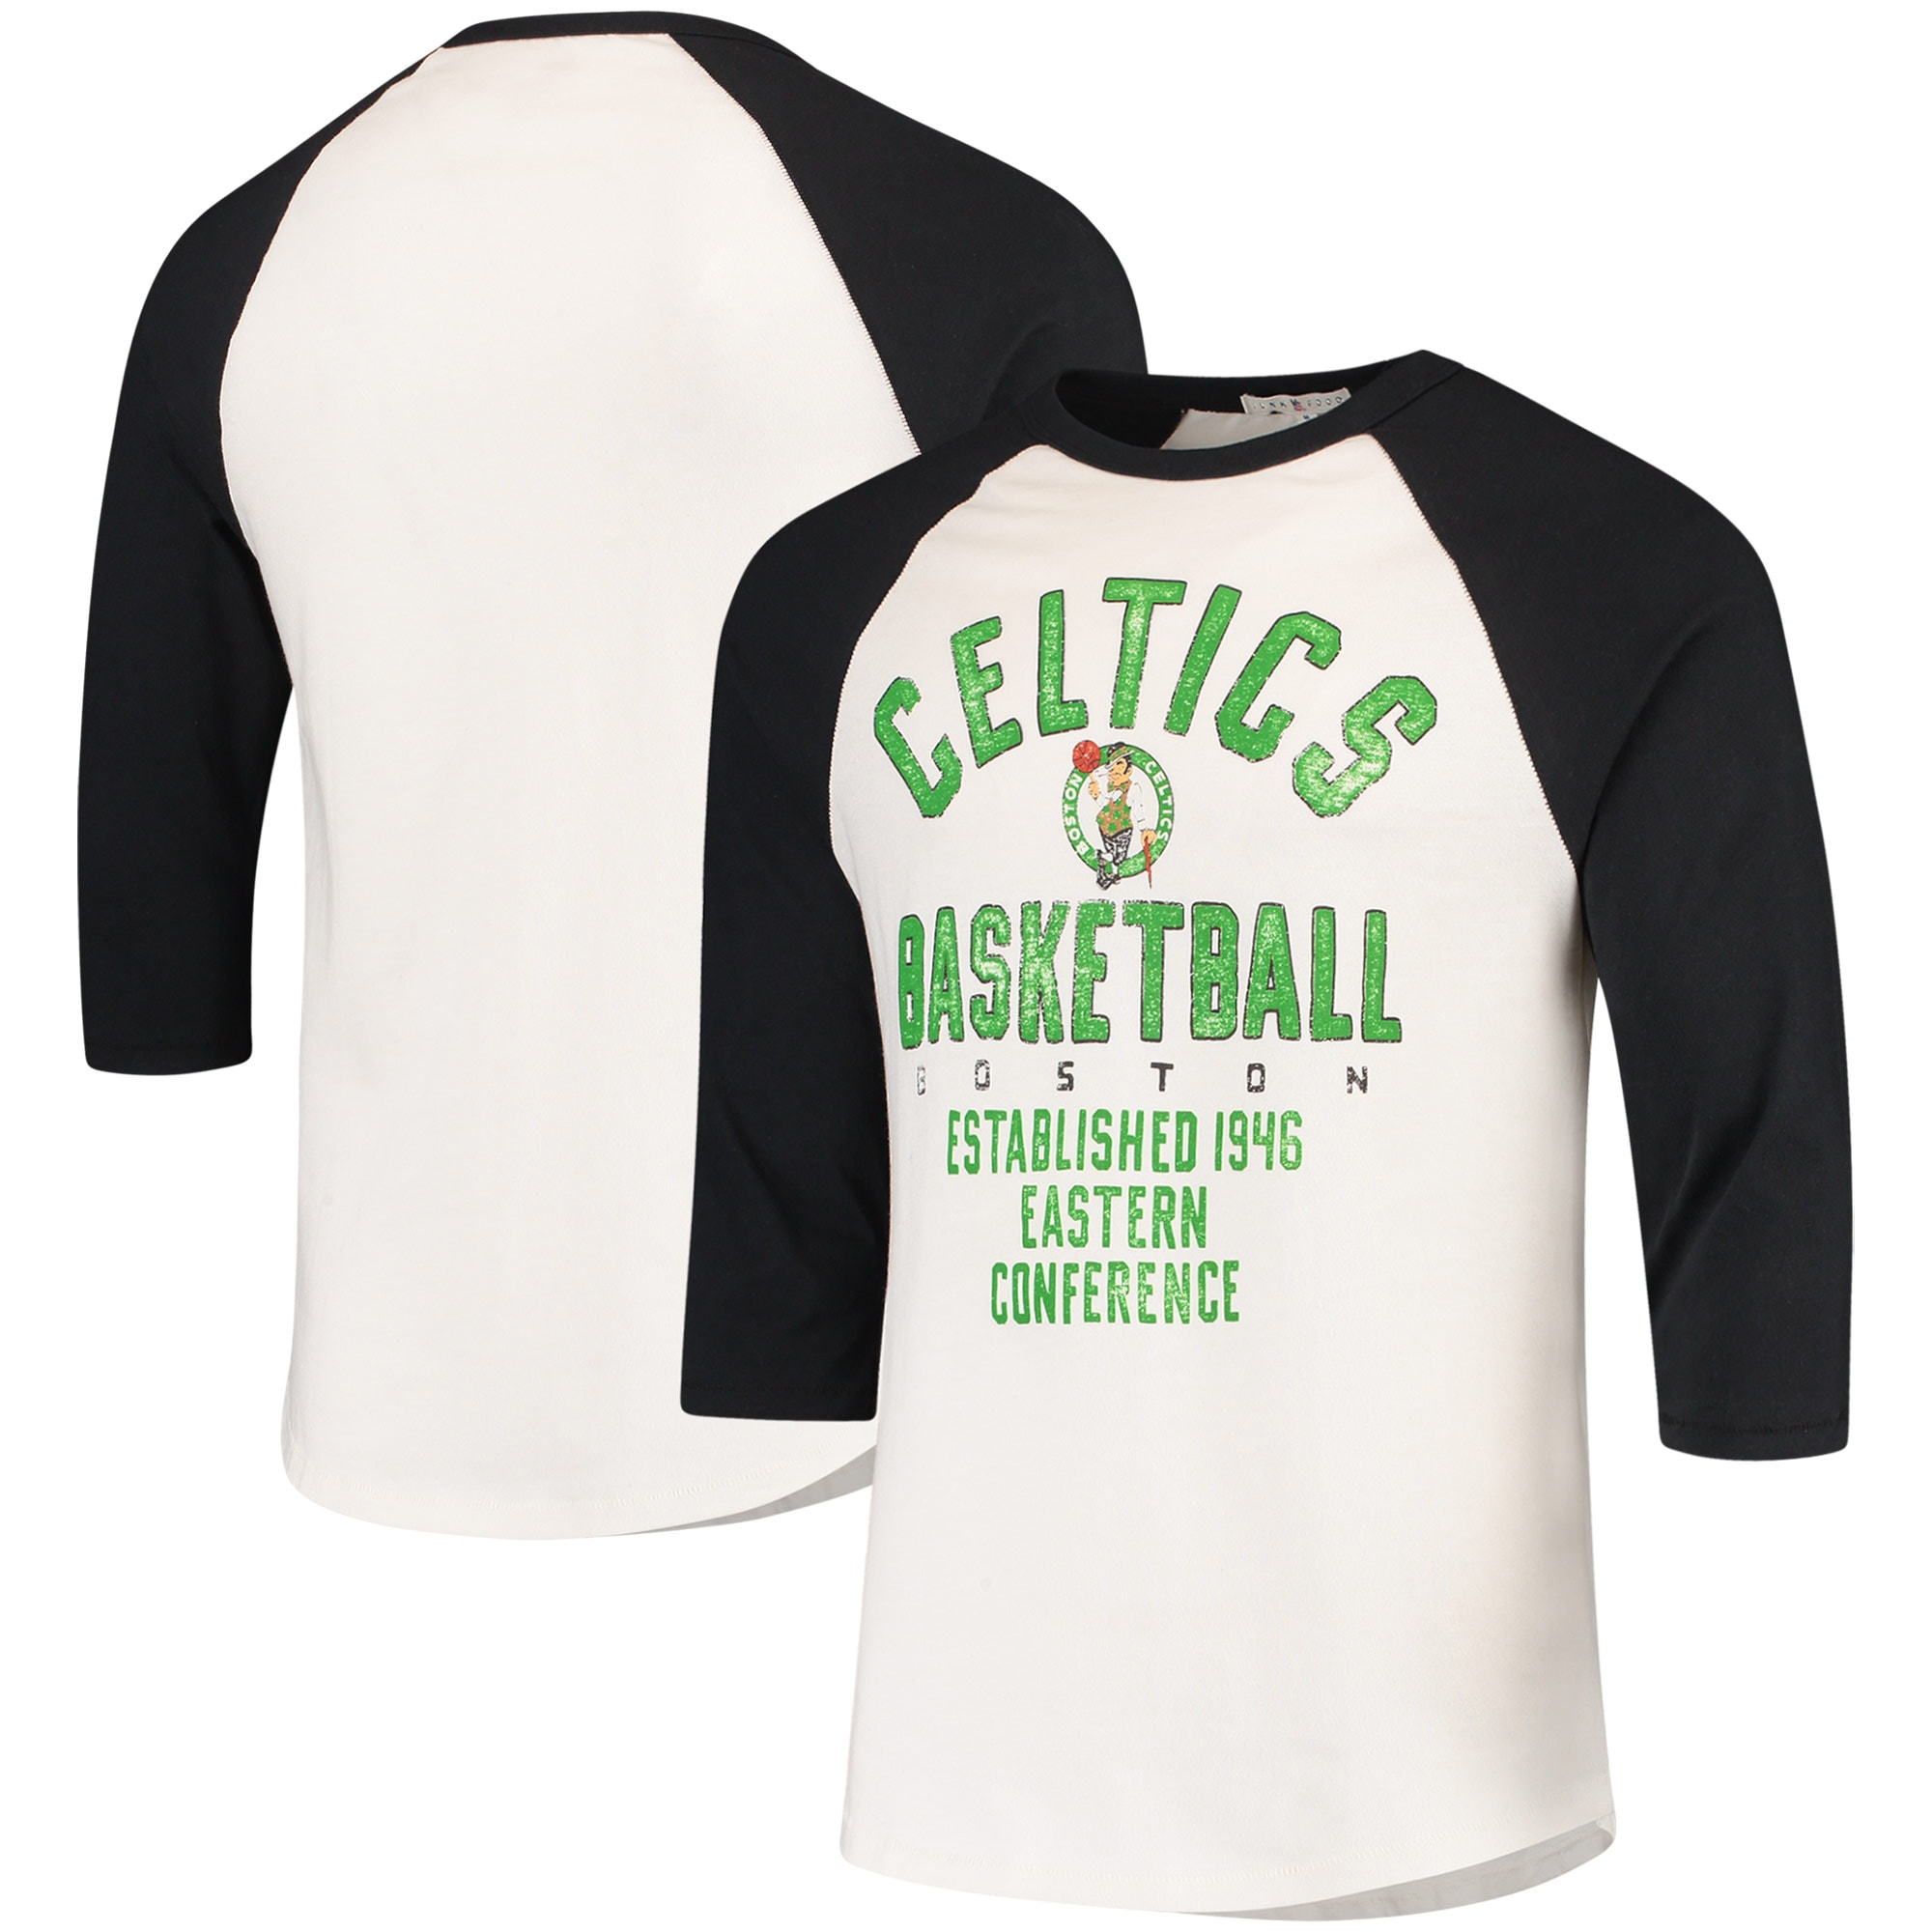 Boston Celtics Junk Food All-American Raglan 3/4-Sleeve T-Shirt - White/Black